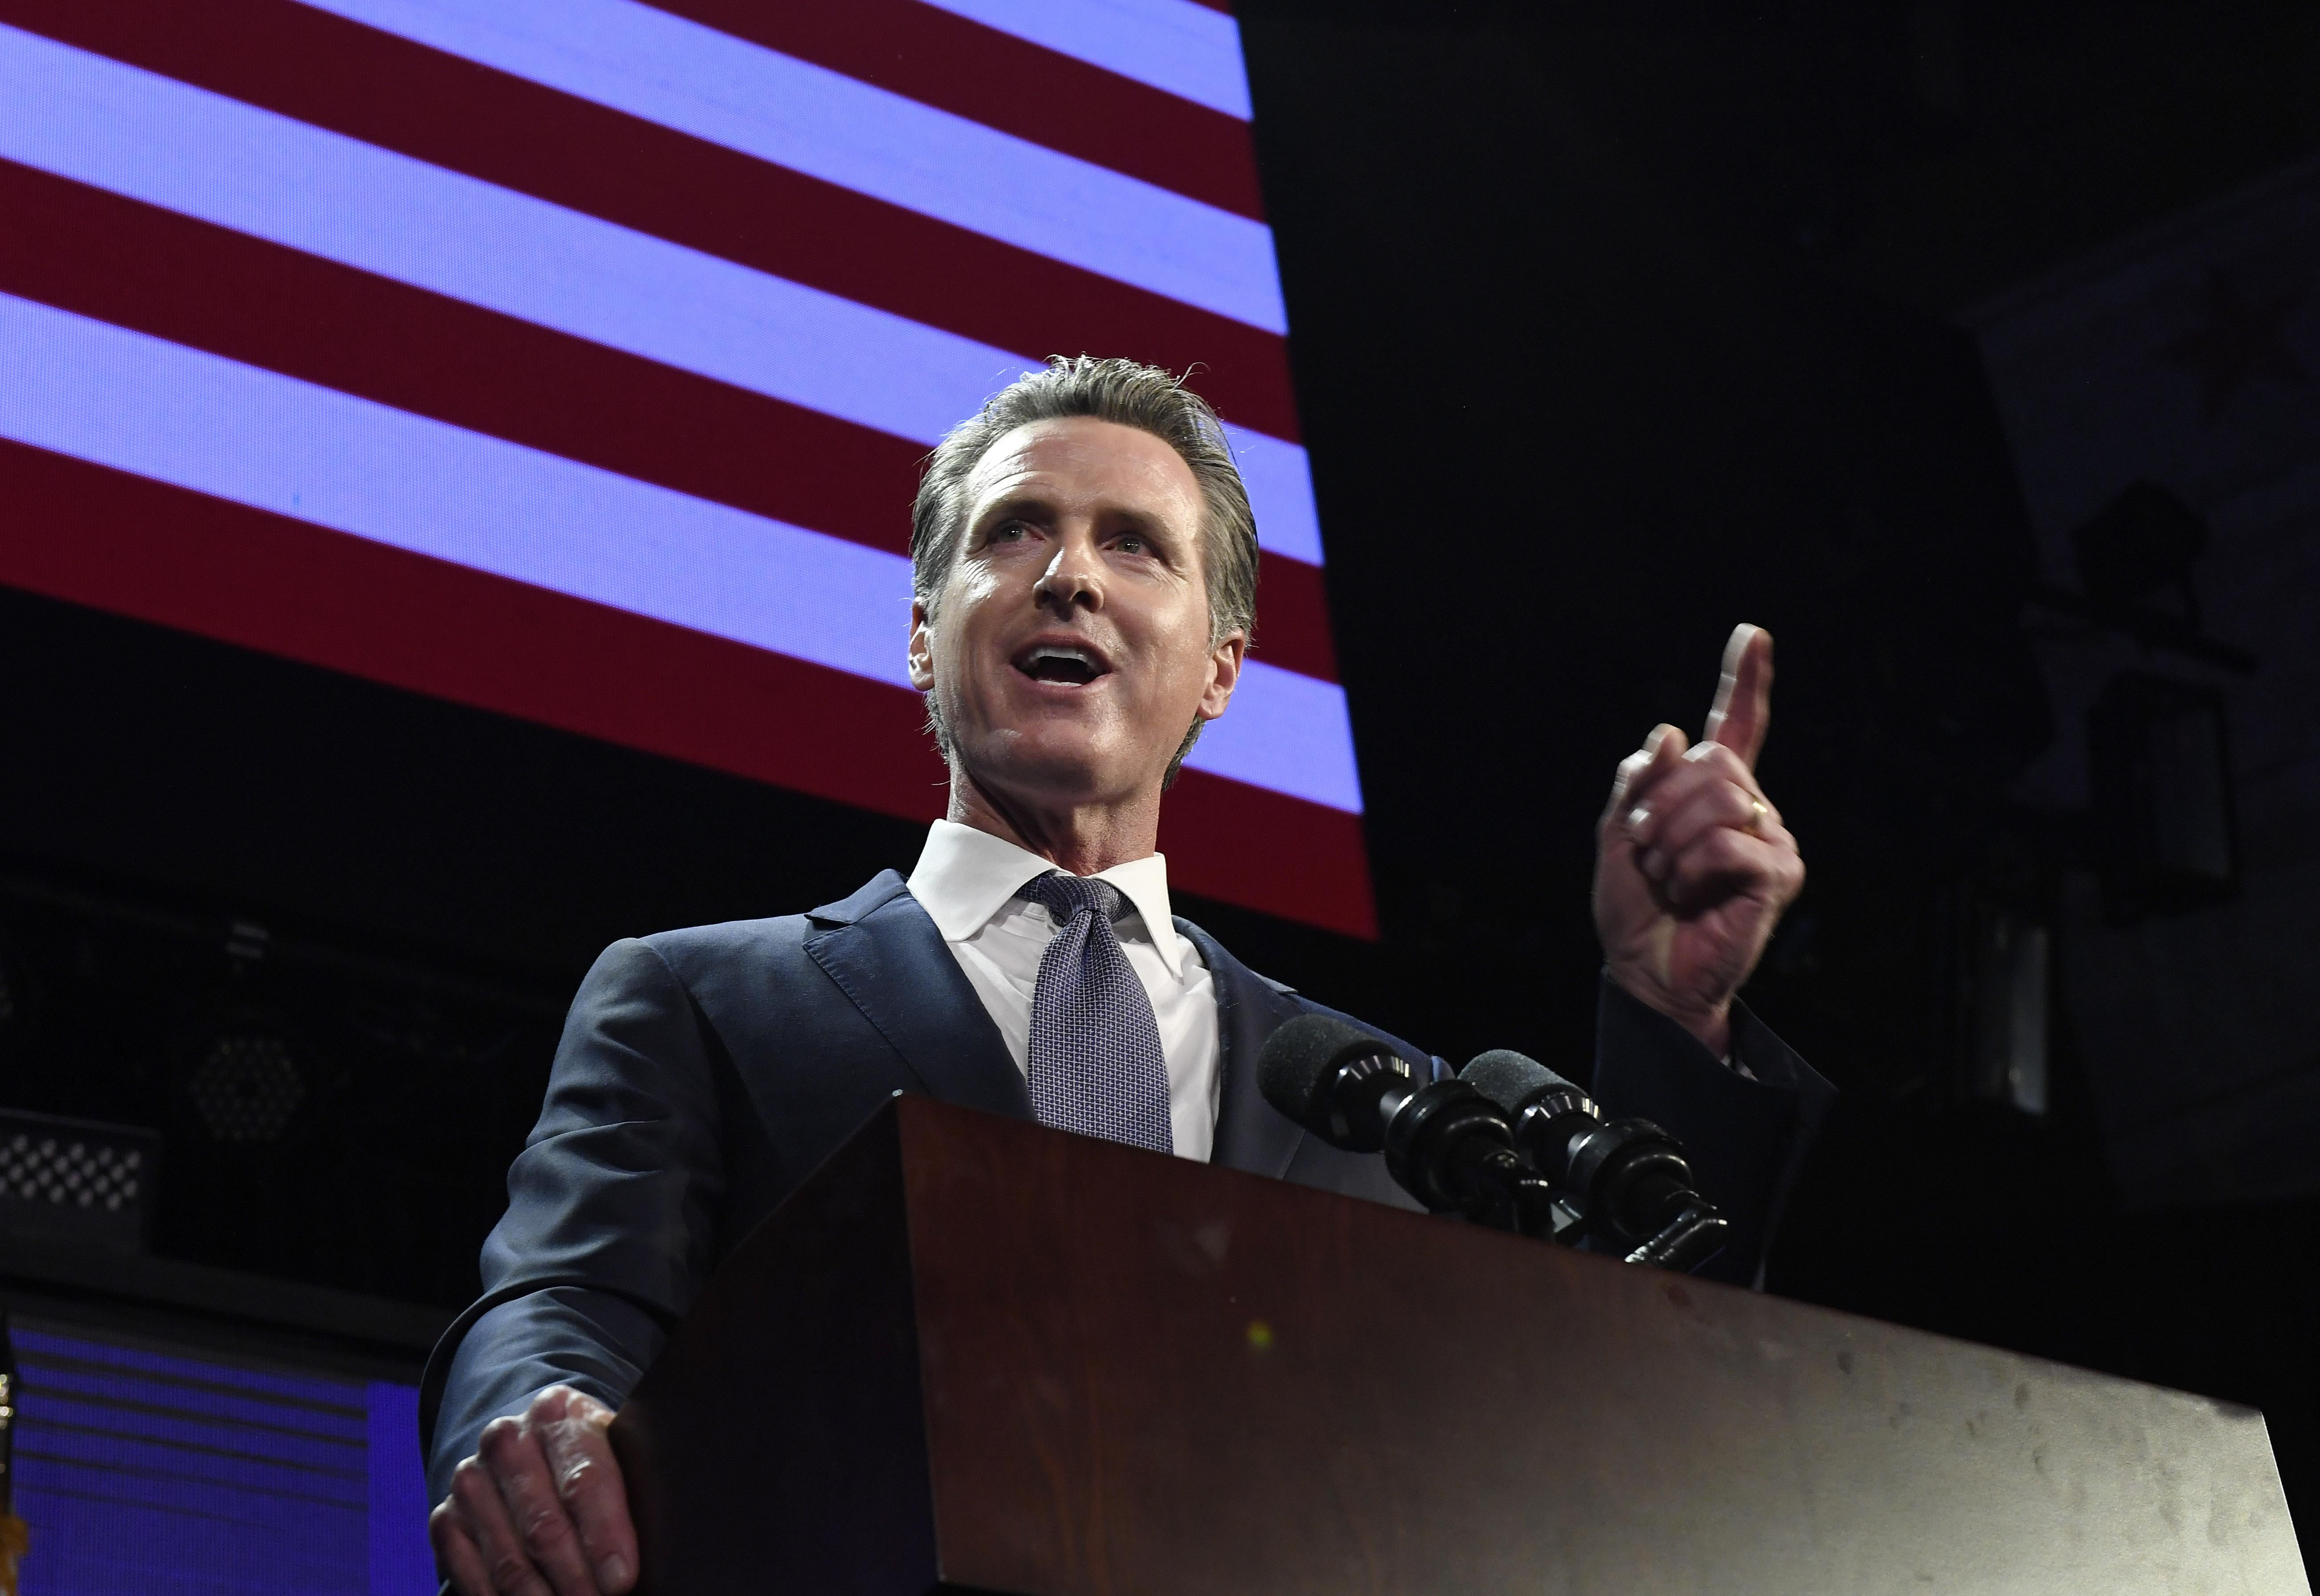 Gavin Newsom speaks during election night event on Nov. 6, 2018 in Los Angeles, California.